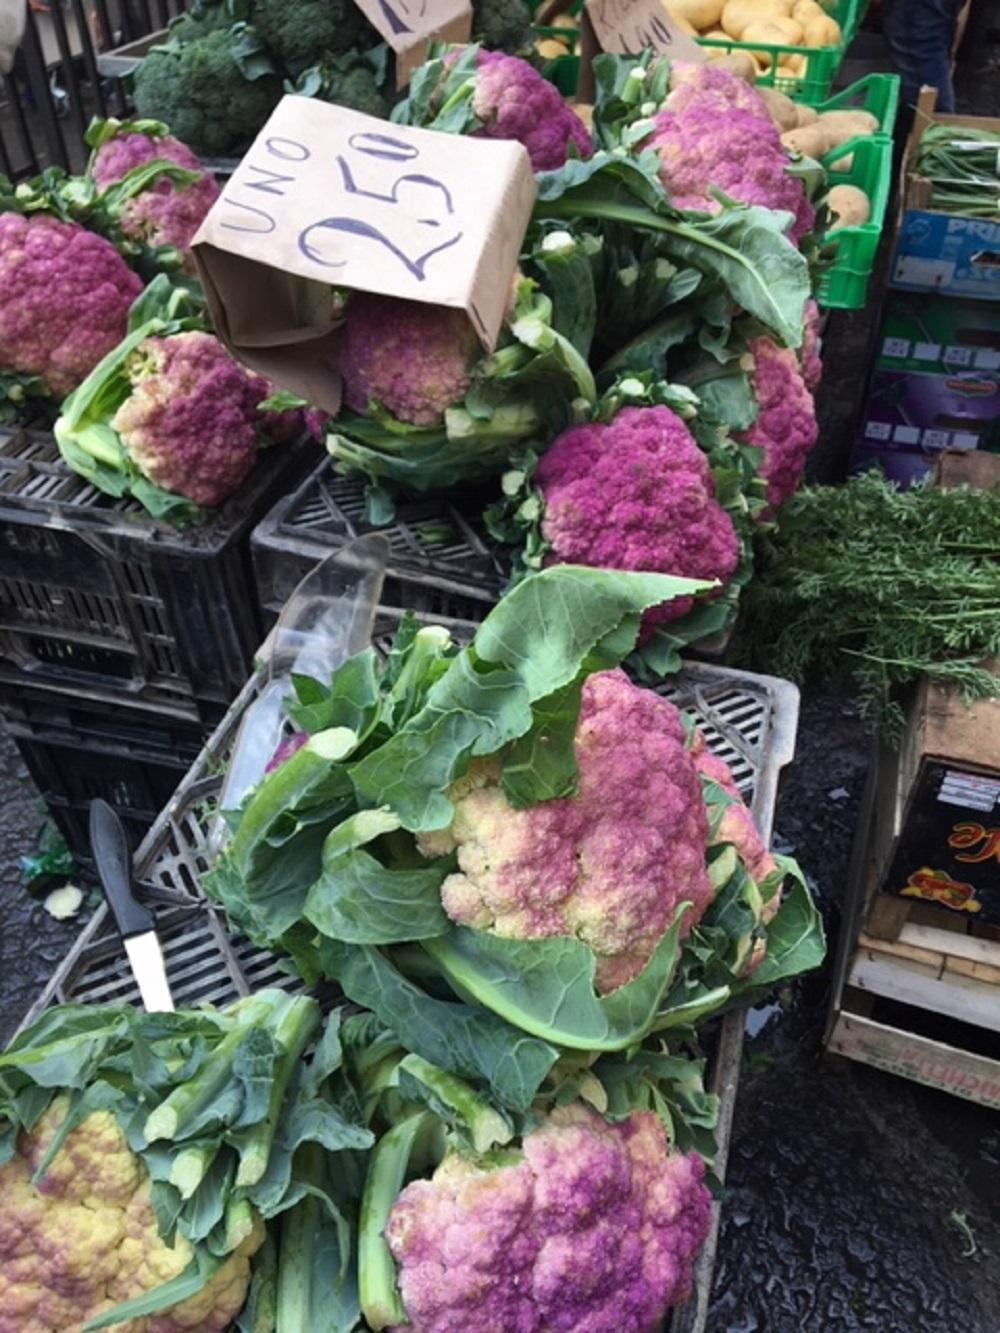 markettour2.jpg